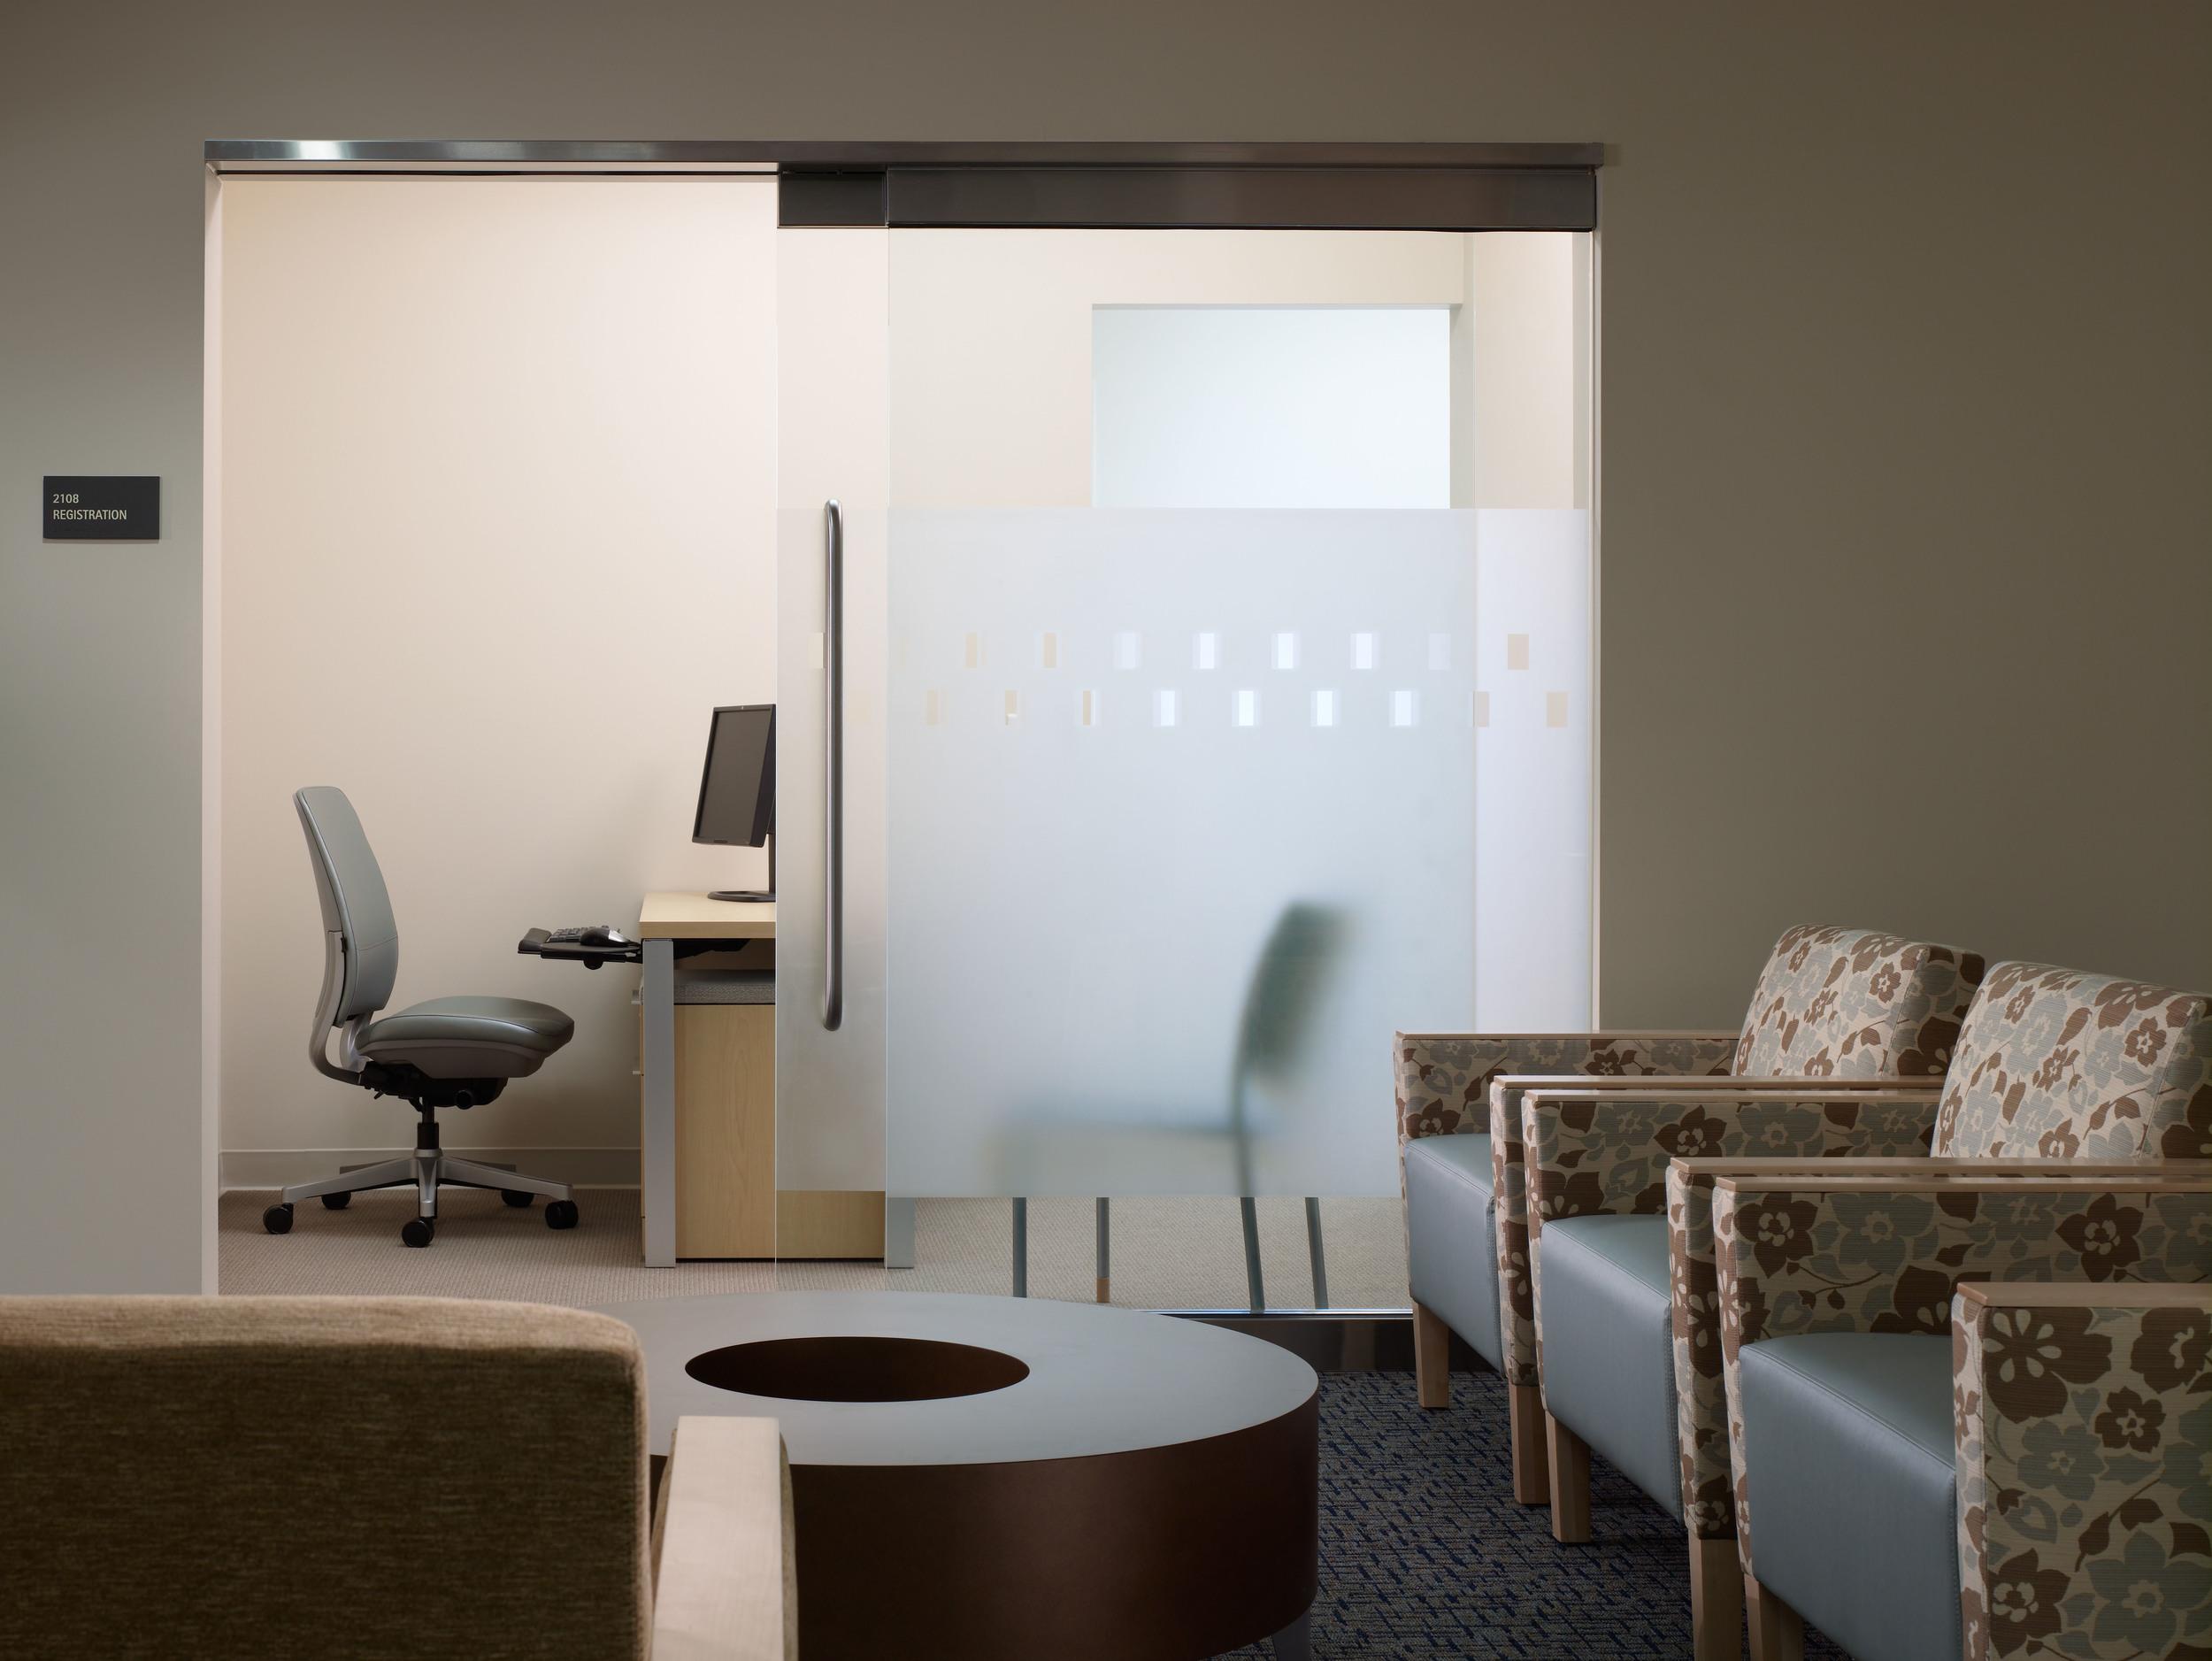 Surgery Waiting Room